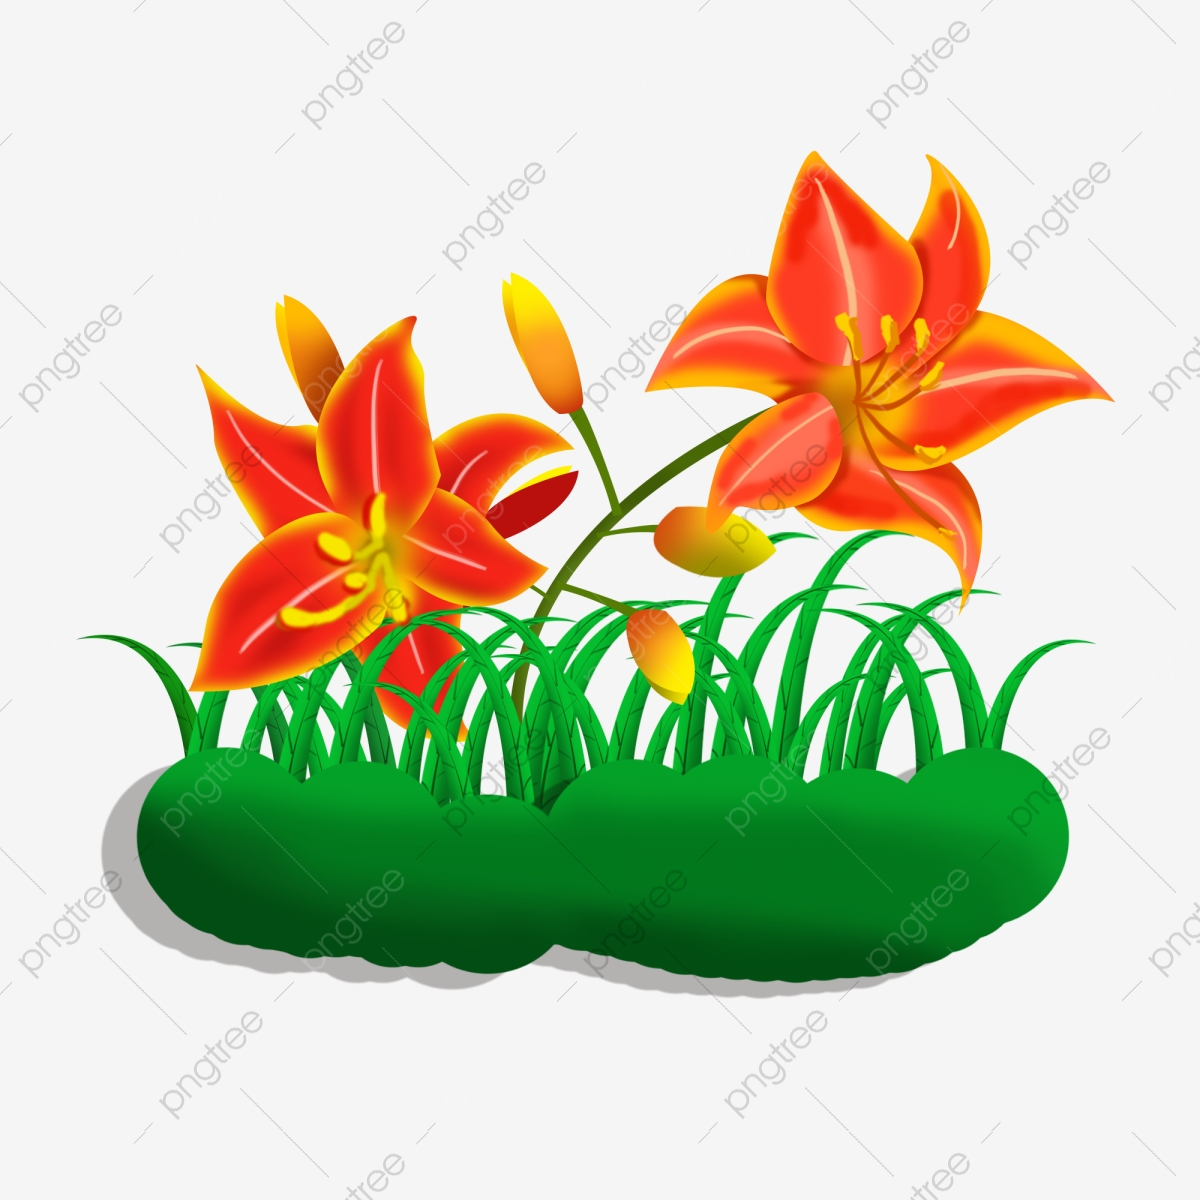 Reka Bentuk 3 Elemen Bunga Sederhana Dan Bergaya Bunga Bunga Halus